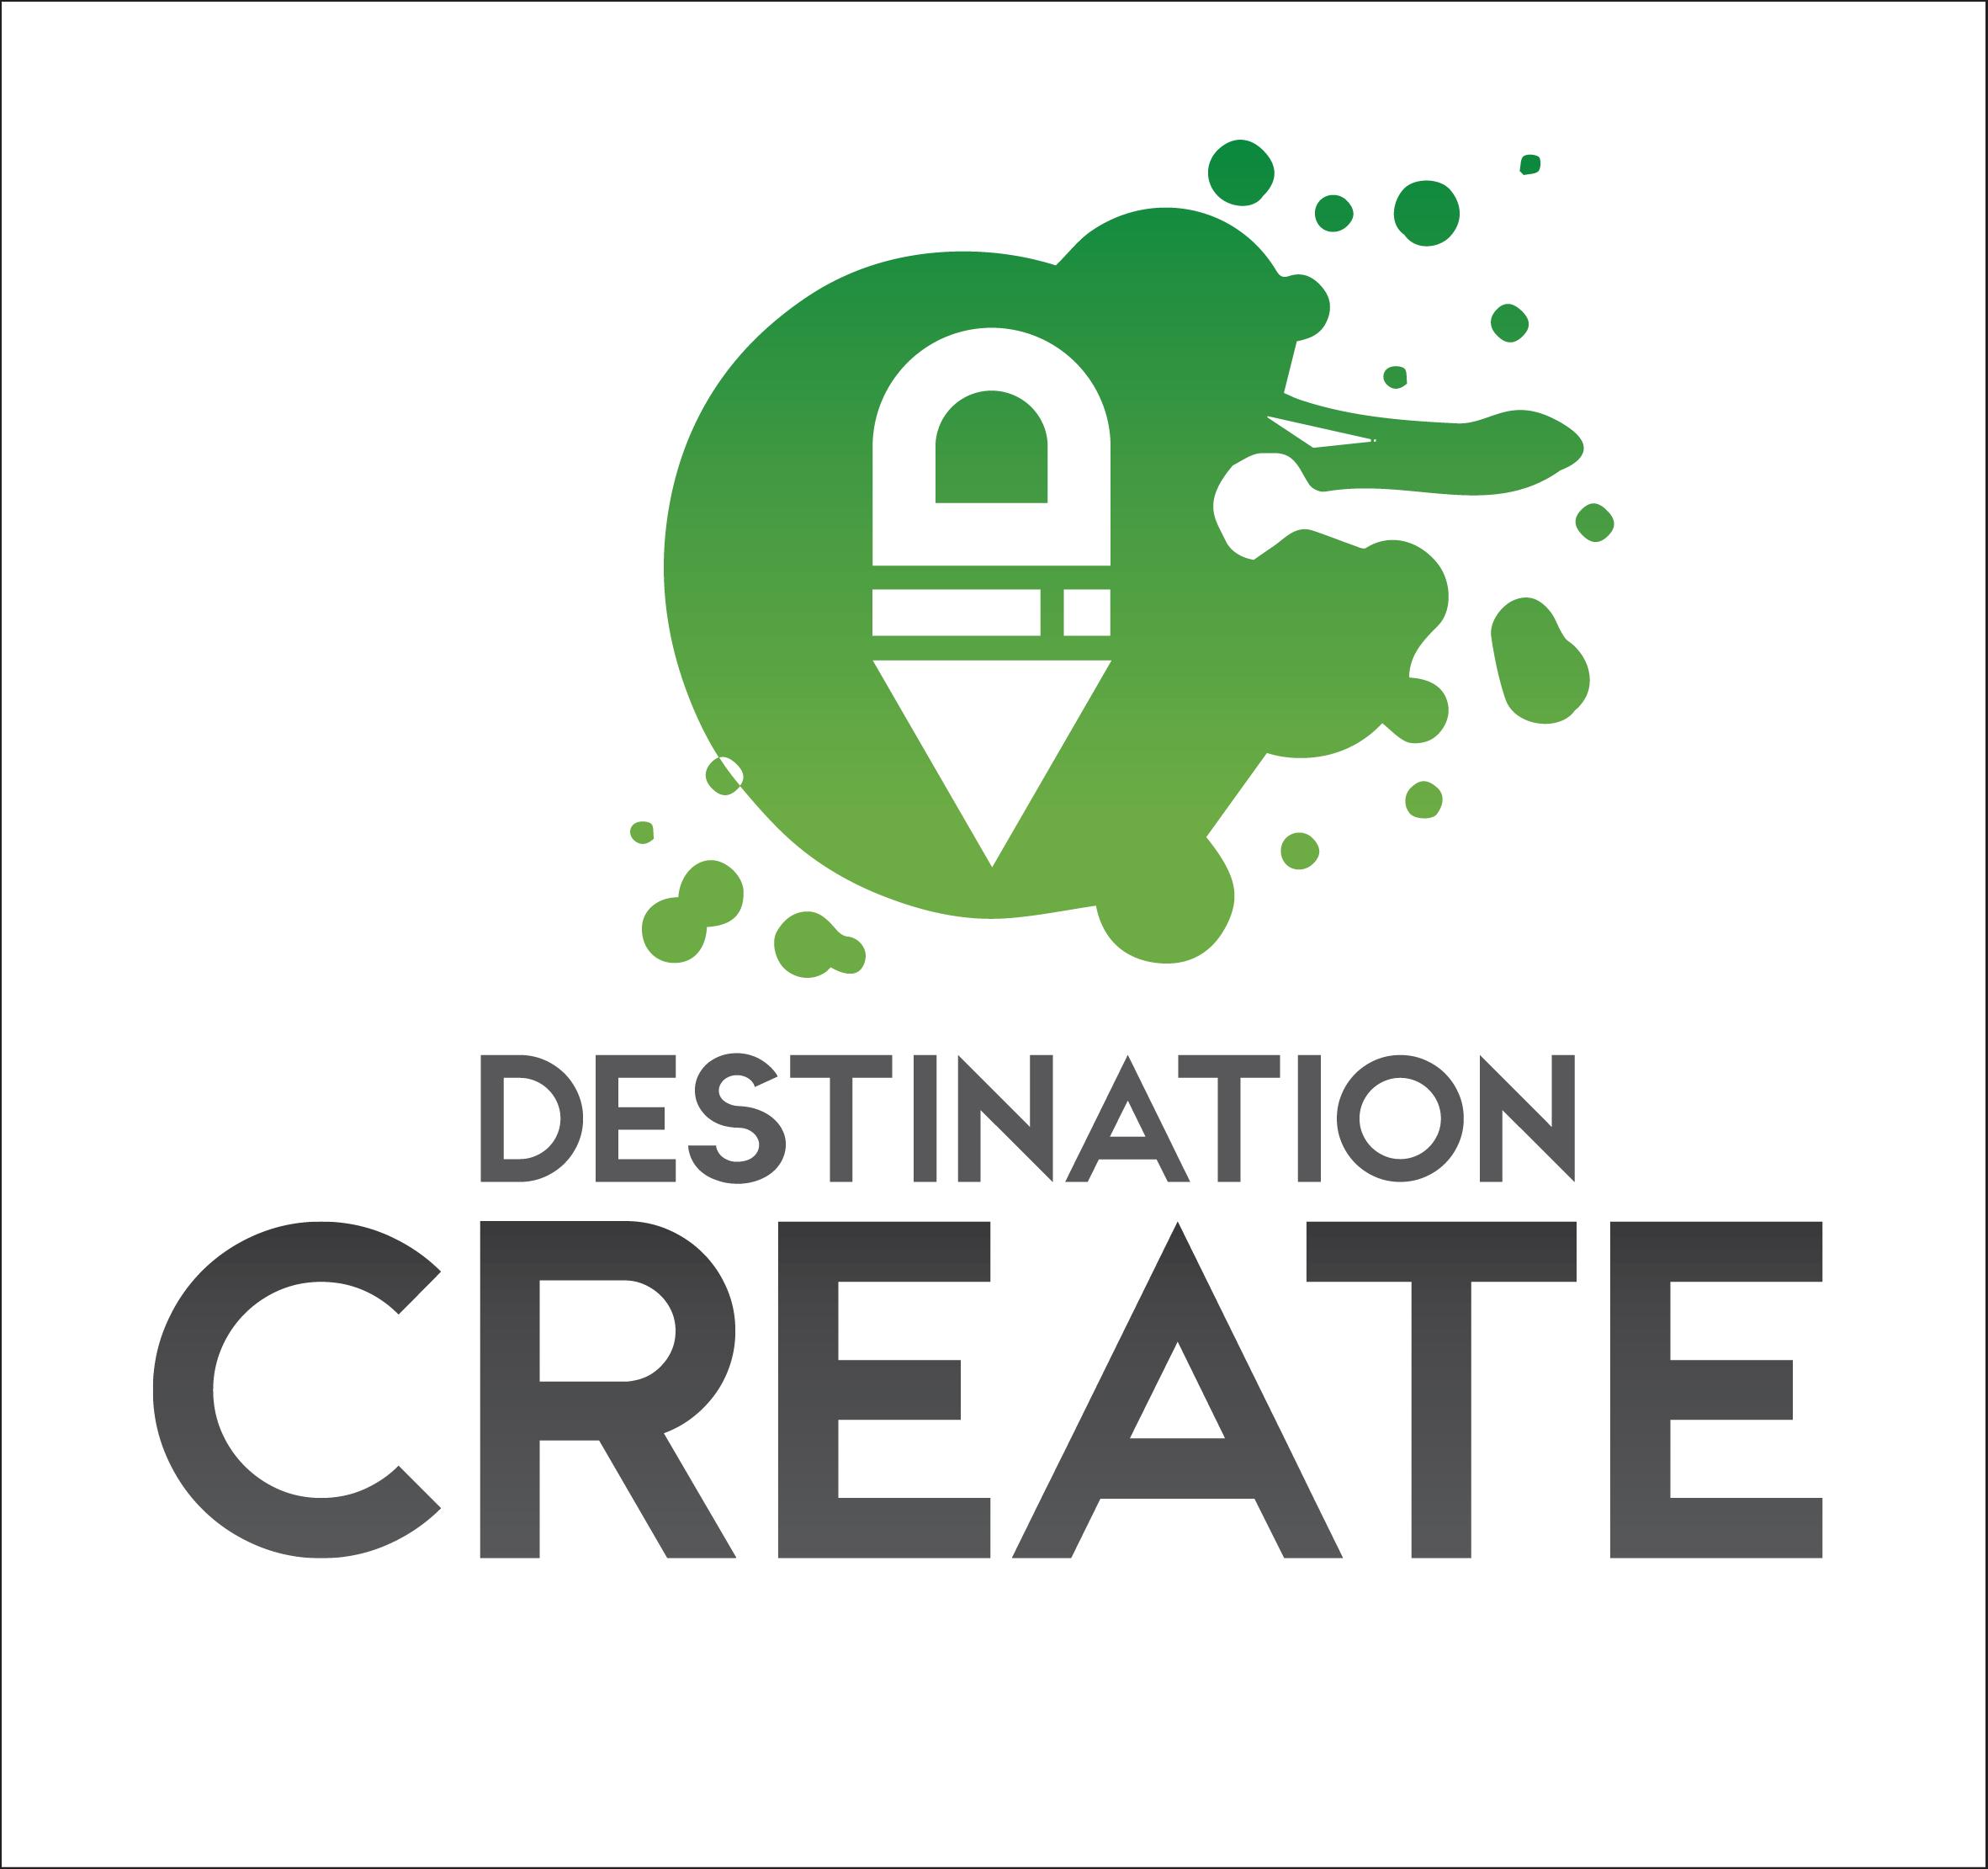 Destination Create logo stack